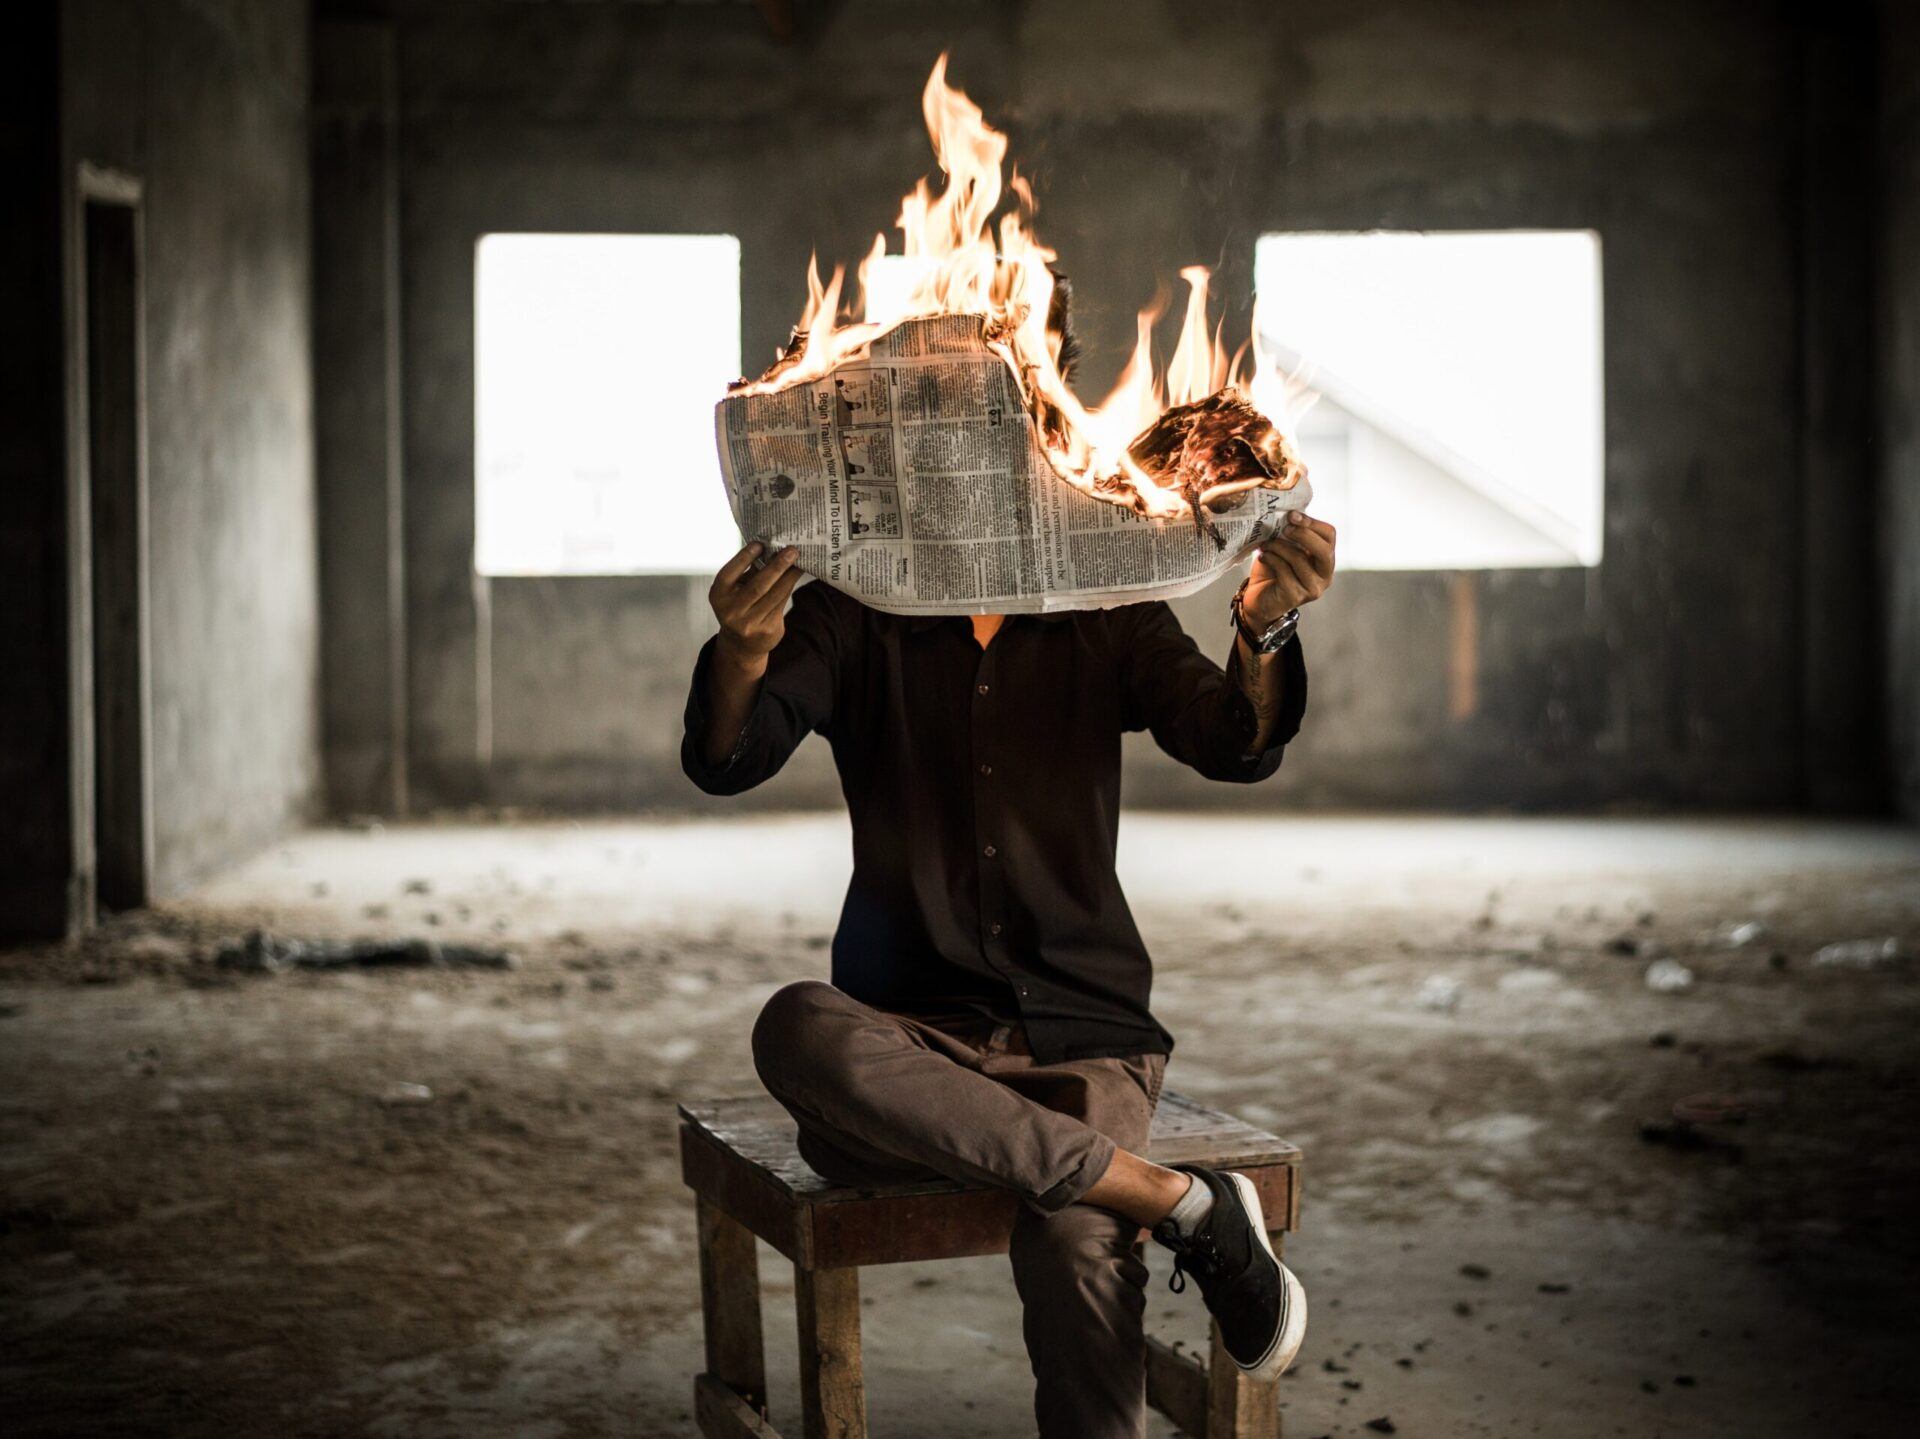 istinite laži - man sitting on chair holding newspaper on fire